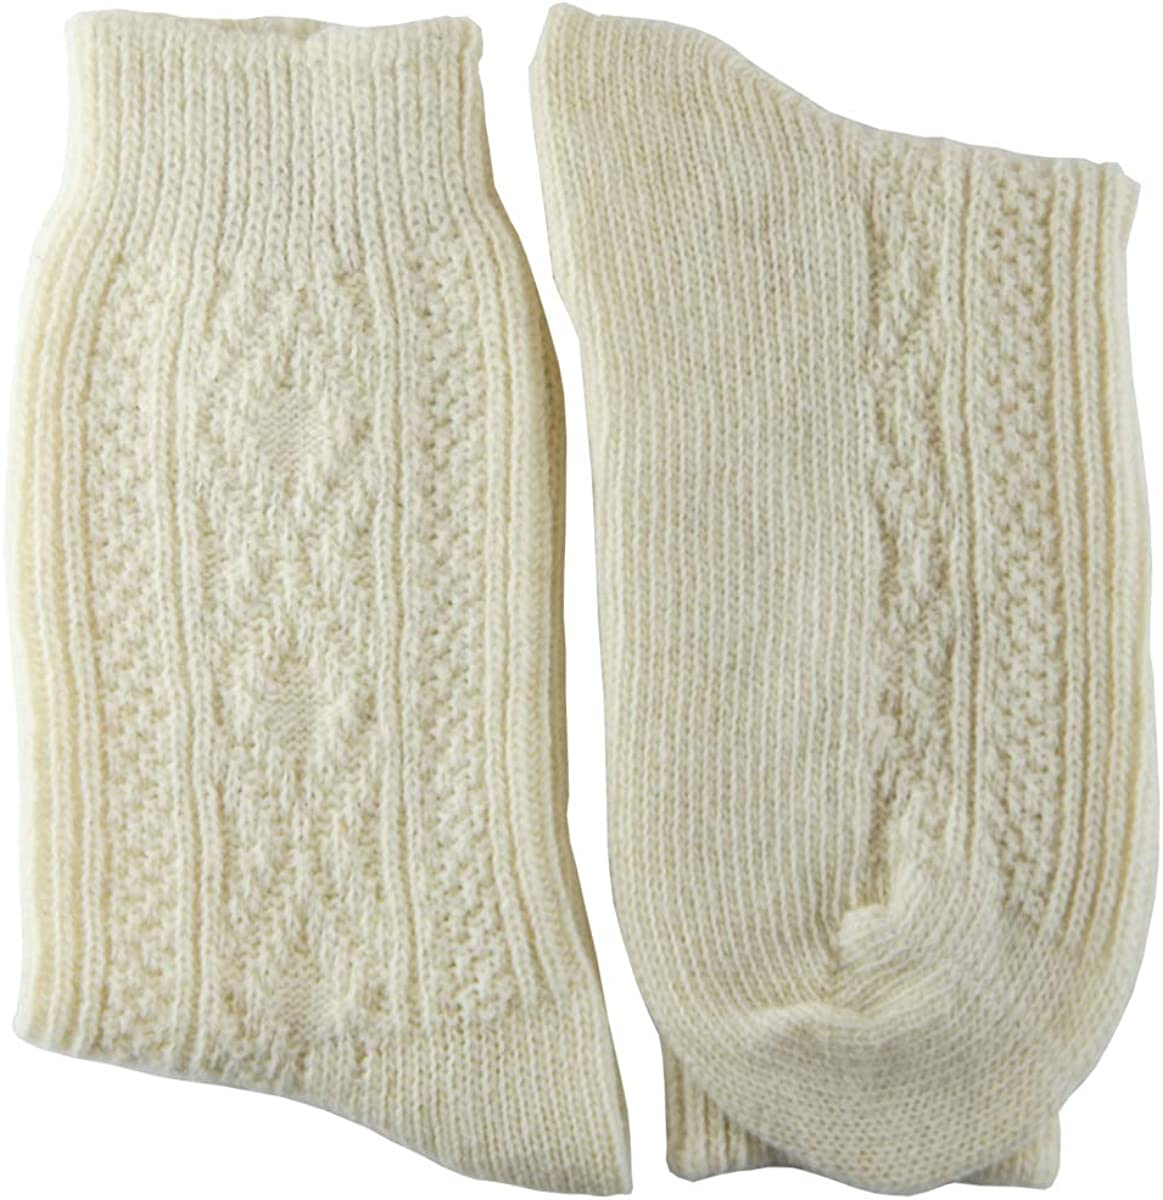 wool Natural 1 pair size 12 NOS WWII US GI 100/% original ST25-2 Socks Cotton